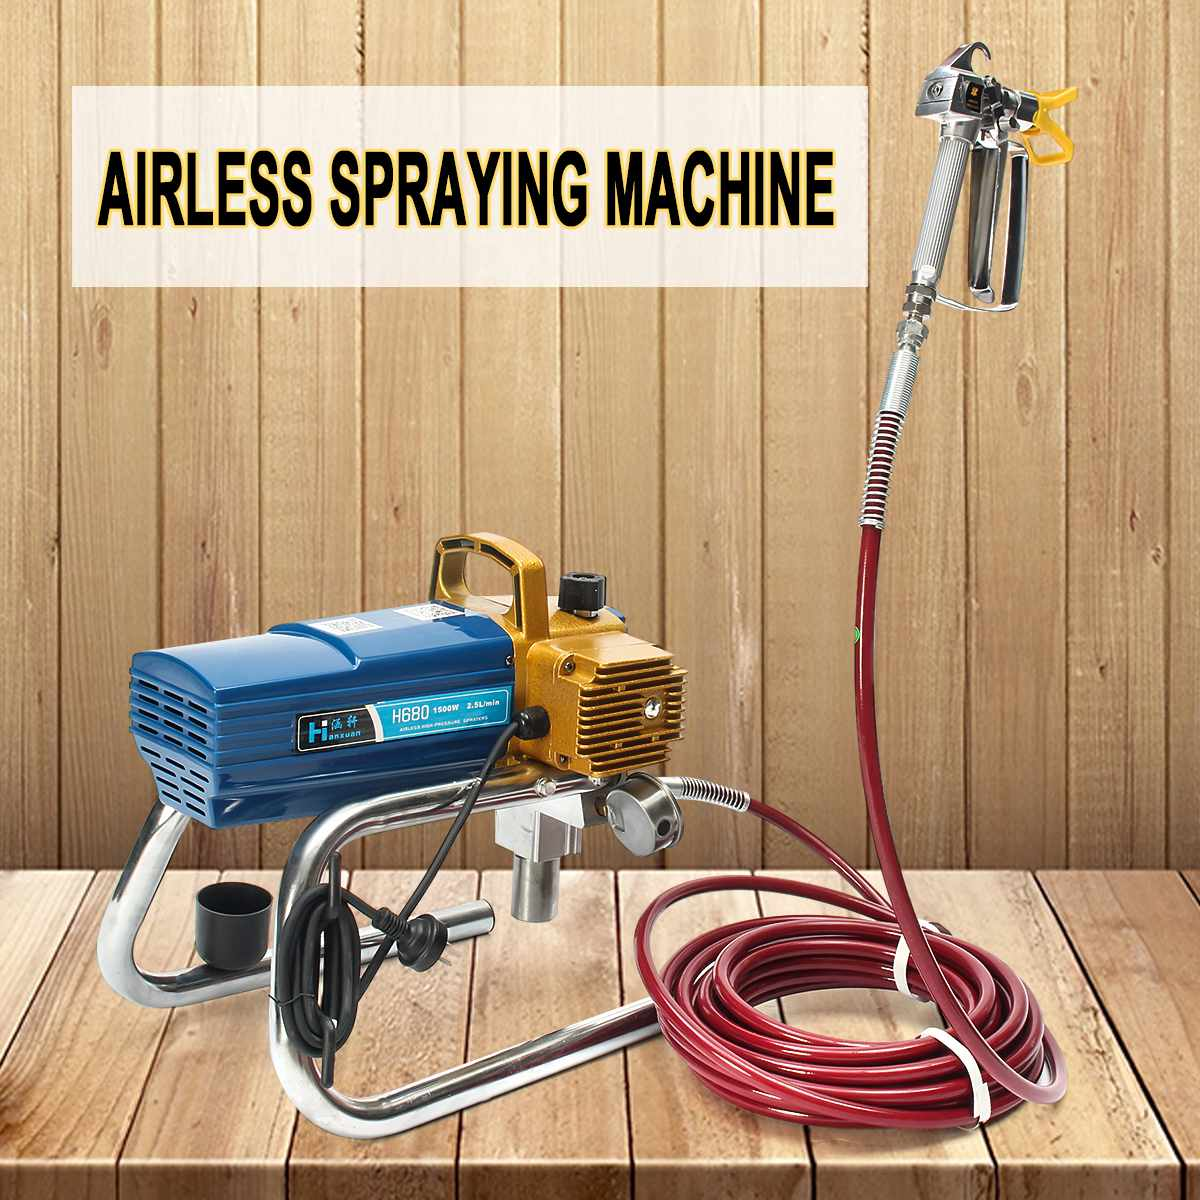 H680 High-pressure Airless Airbrush Paint Sprayer 1500W 220V Airless Spray Gu n For Painting Art Auto Repair Tool